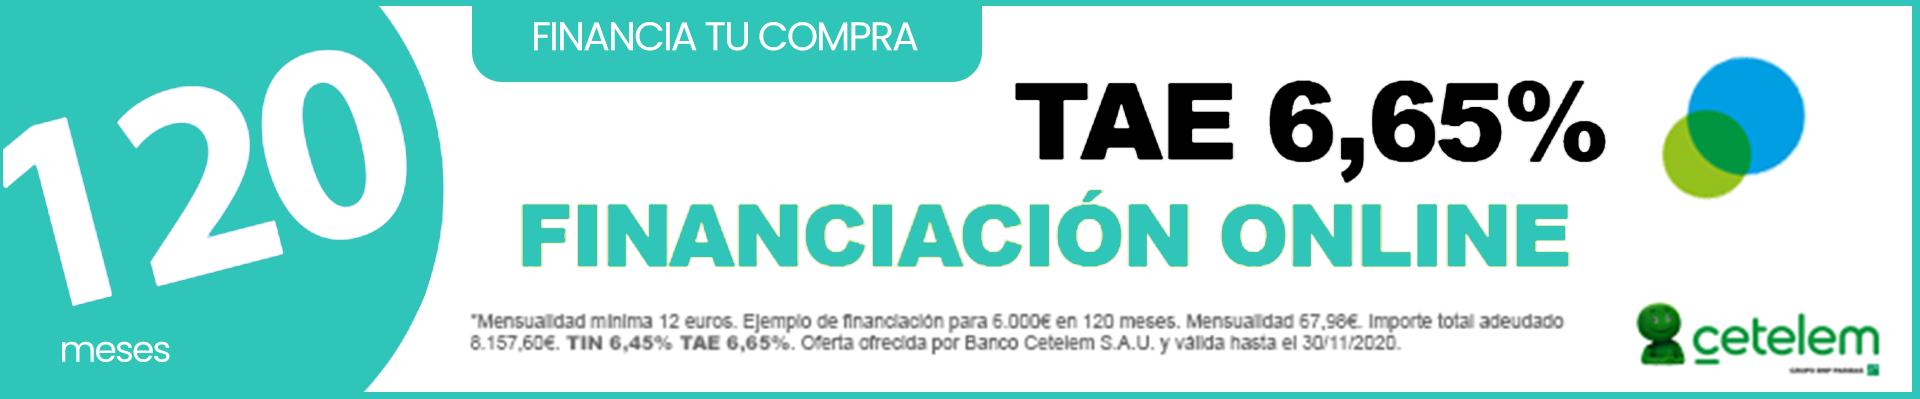 Financiacion-Social-Energy-Cetelem